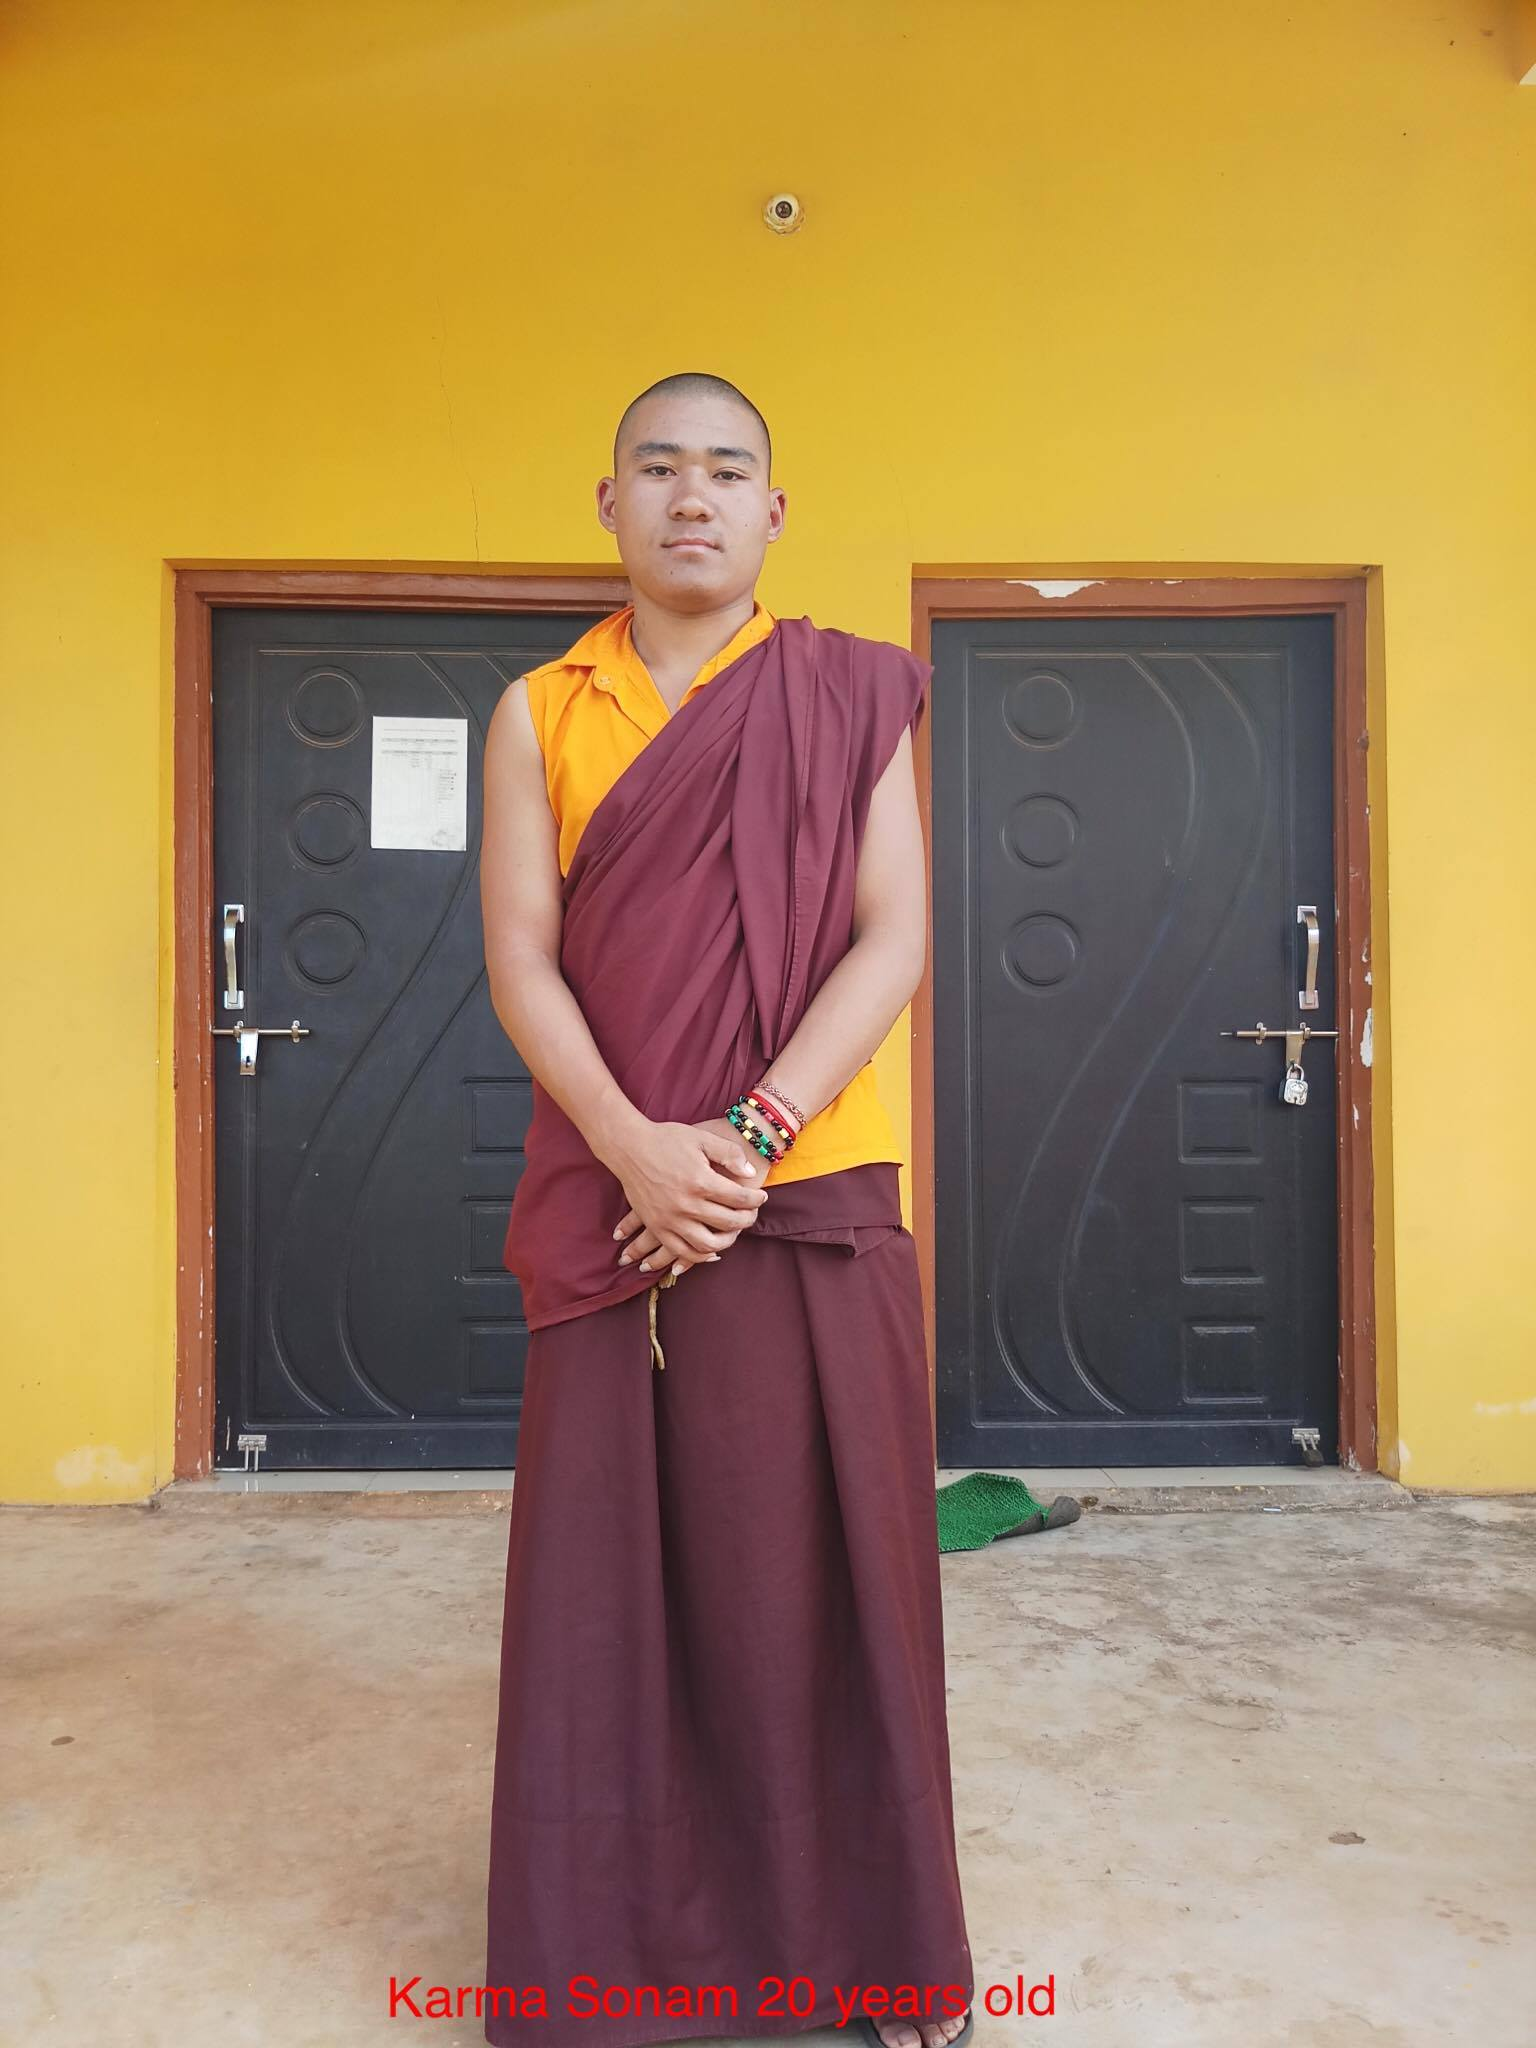 Monk_Karma_Sonam_20yrs_old.jpg